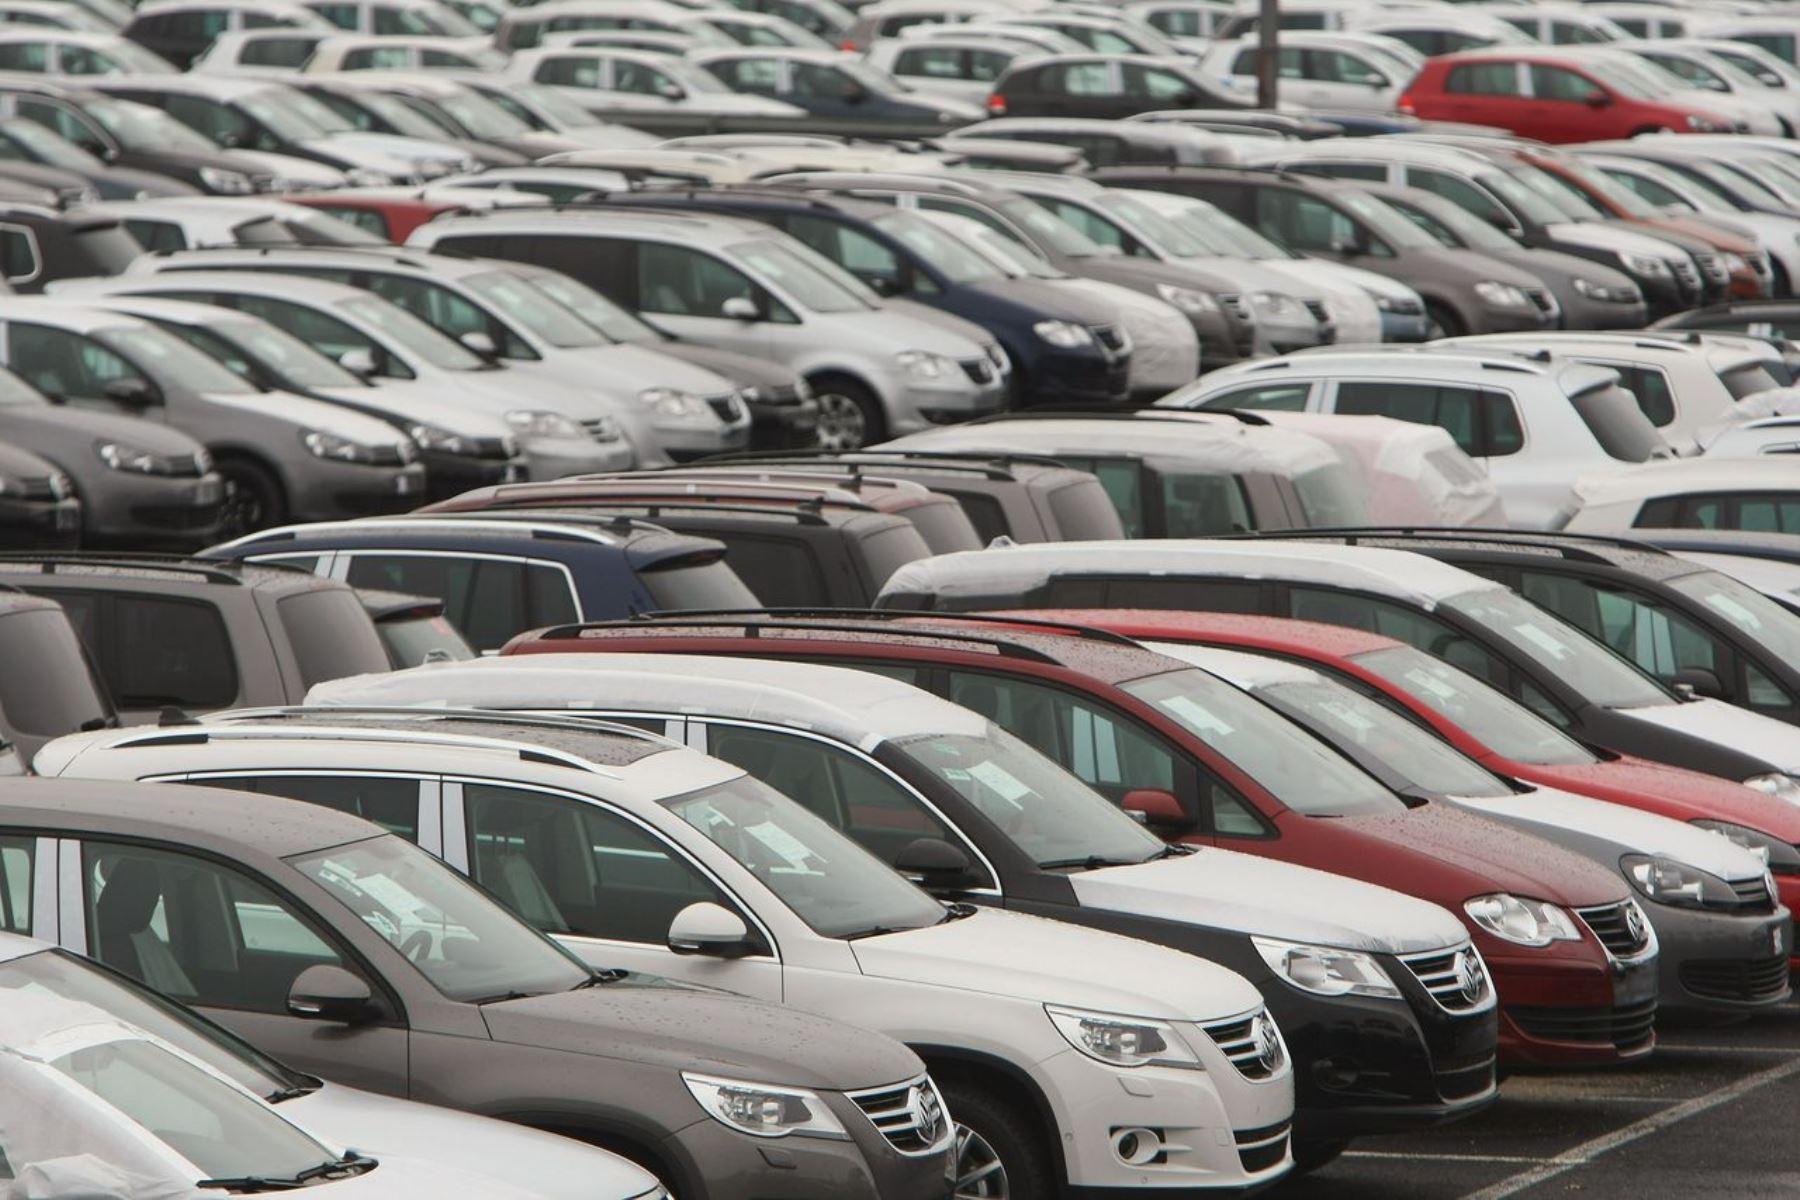 Aap ley 30536 facilitar venta de autos usados para for Compra de comedores nuevos